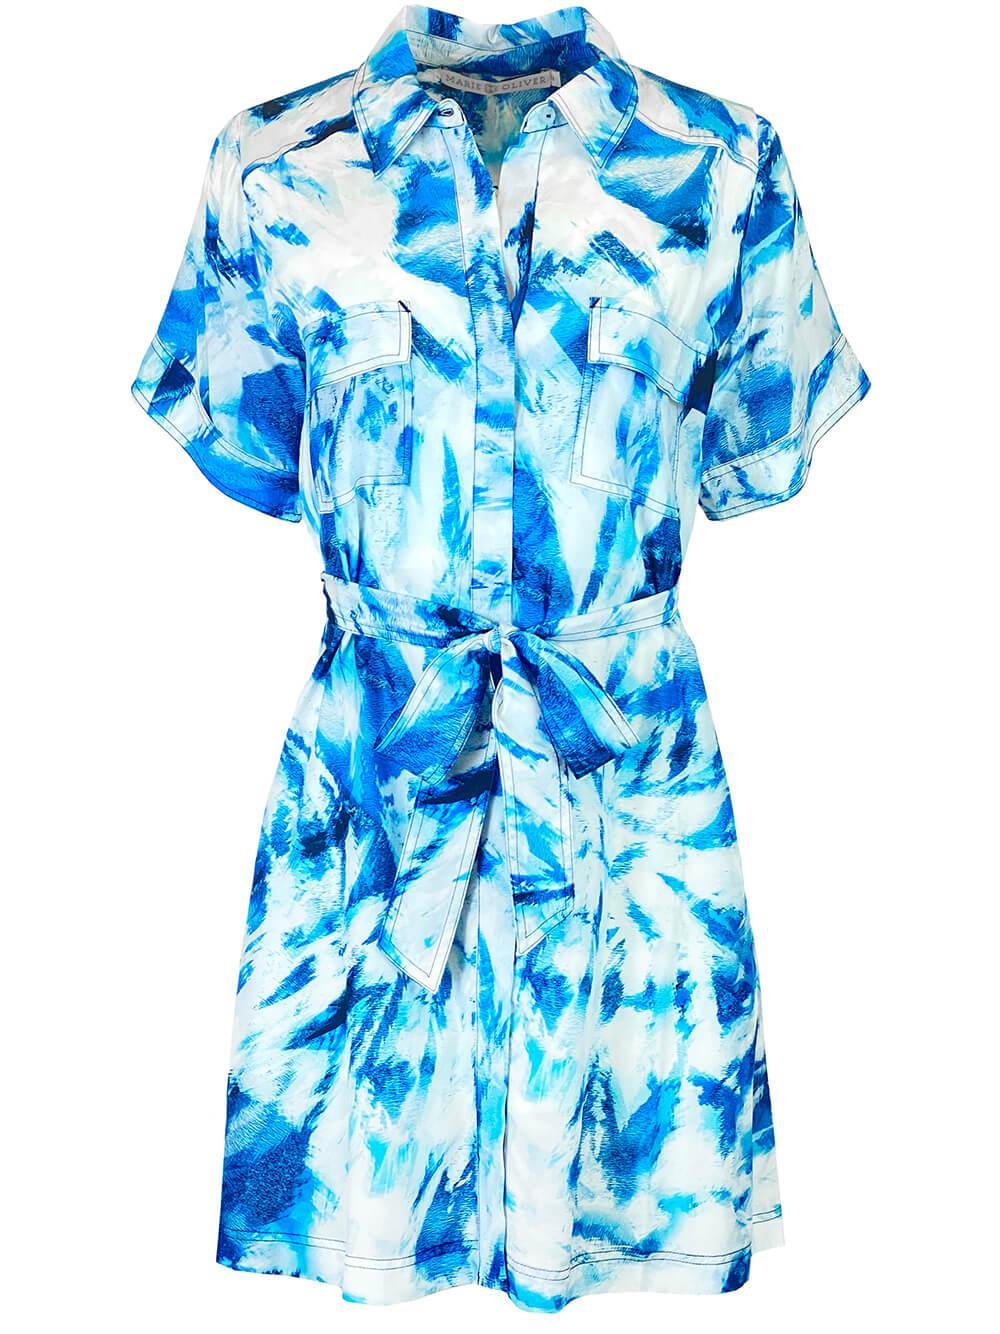 Kali Shirt Dress Item # 2Y5-107-203C